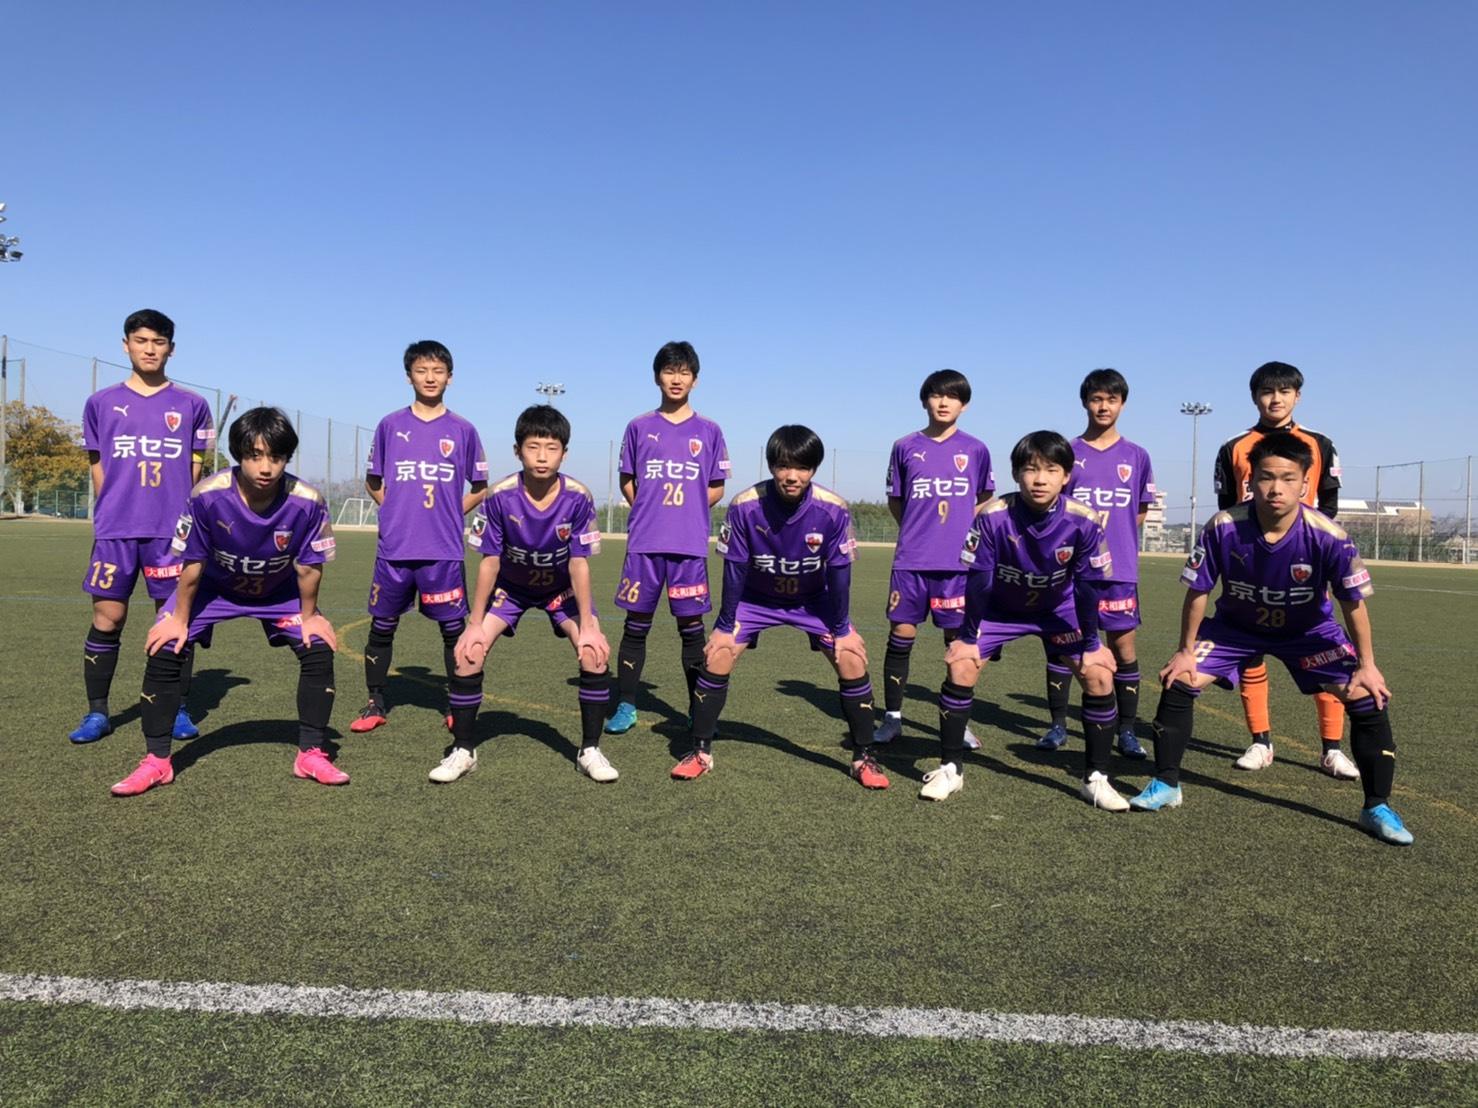 【U-14】高円宮杯JFA U-15サッカーリーグ滋賀2021 TOPリーグ第2節